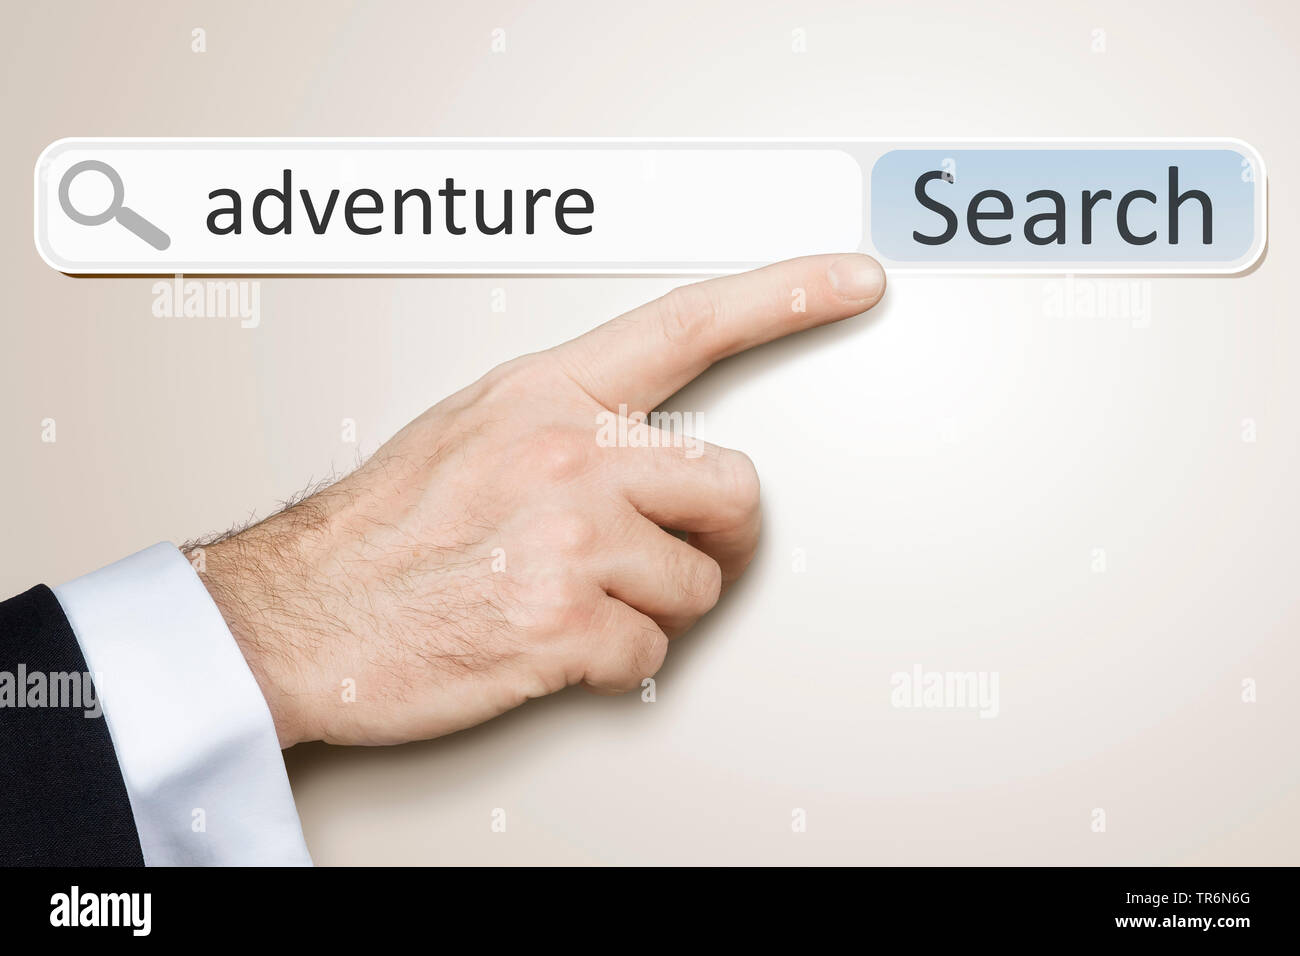 Symbolfoto Internet-Recherche adventure, Abenteuer | internet research adventure | BLWS487599.jpg [ (c) blickwinkel/McPHOTO/M. Gann Tel. +49 (0)2302-2 - Stock Image